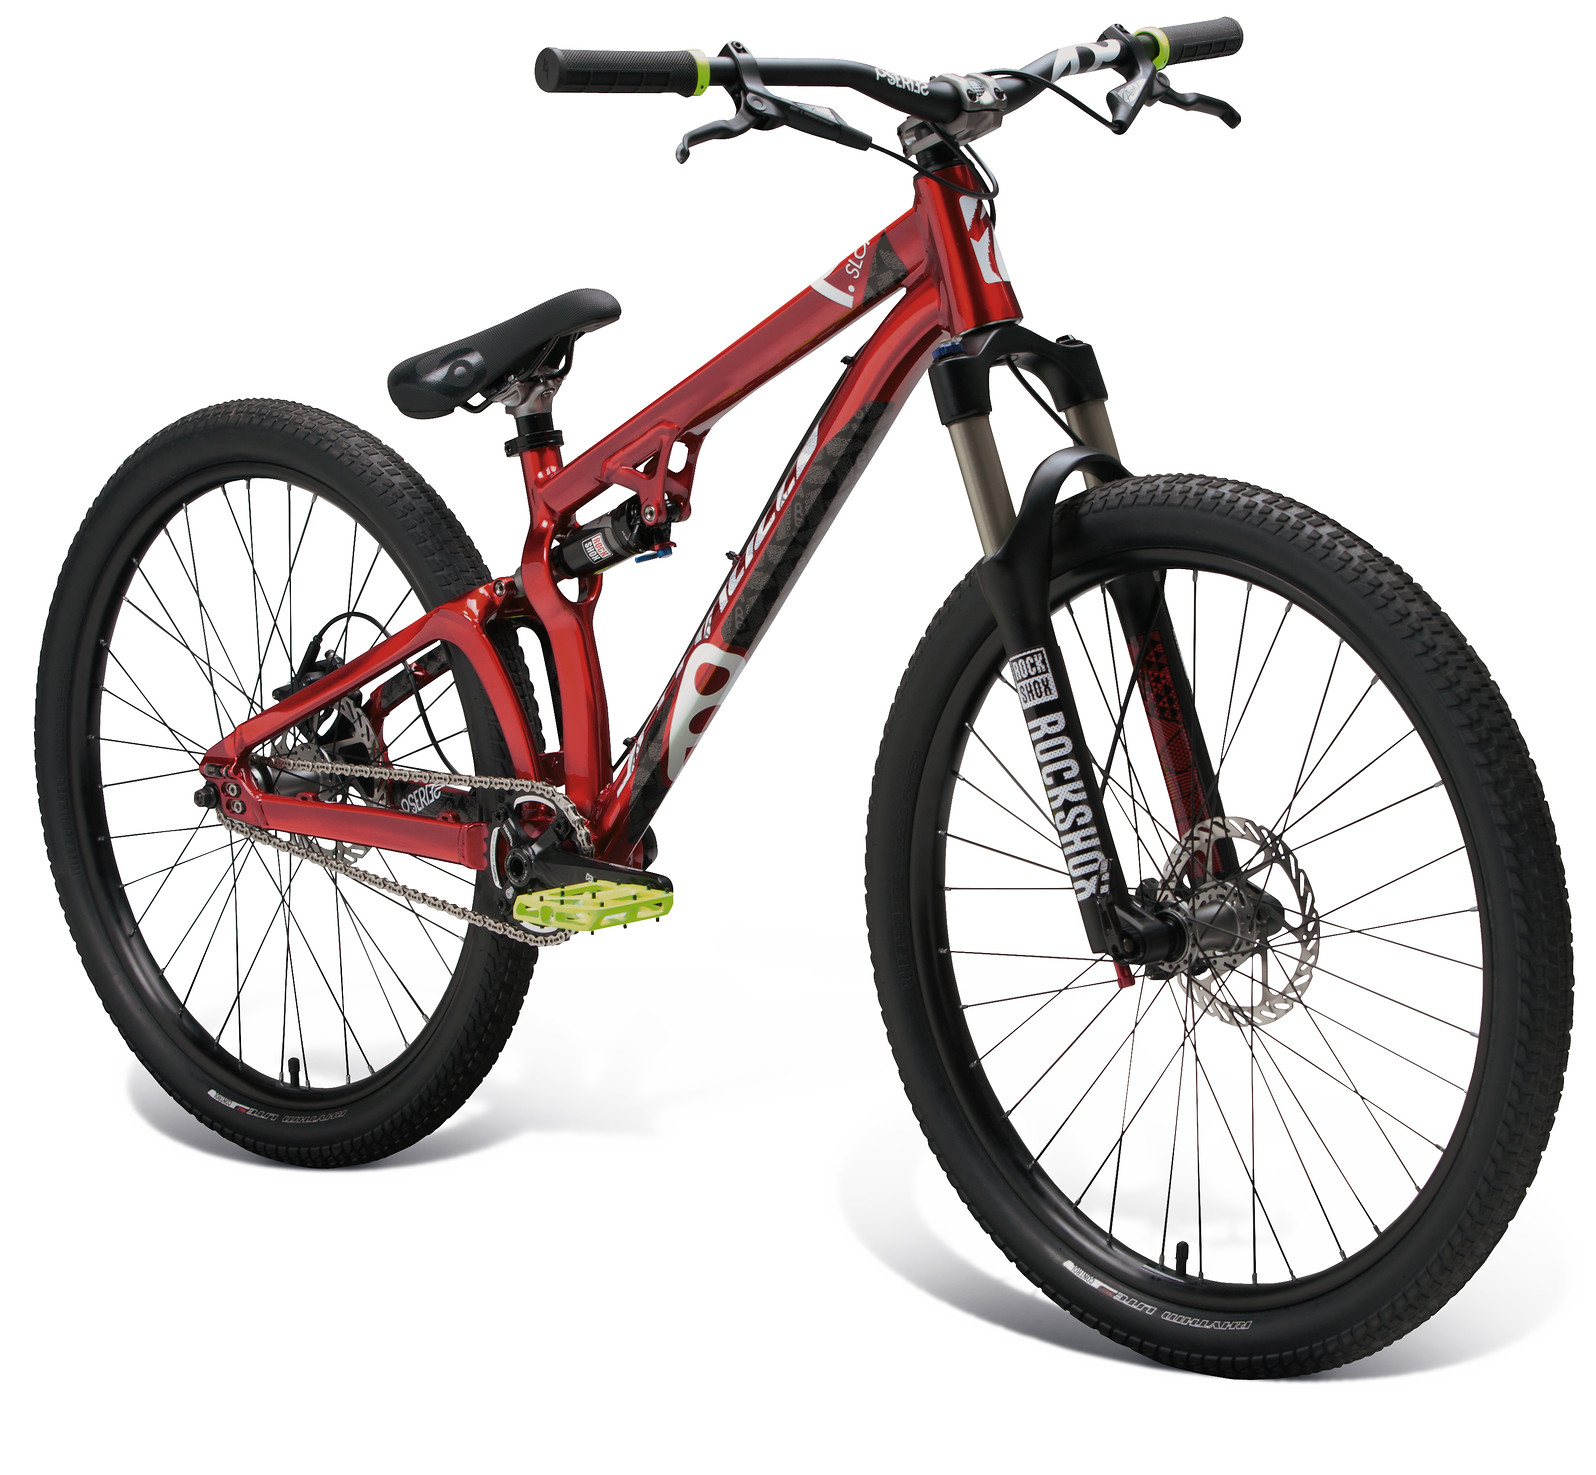 2013 Specialized P Slope Bike Reviews Comparisons